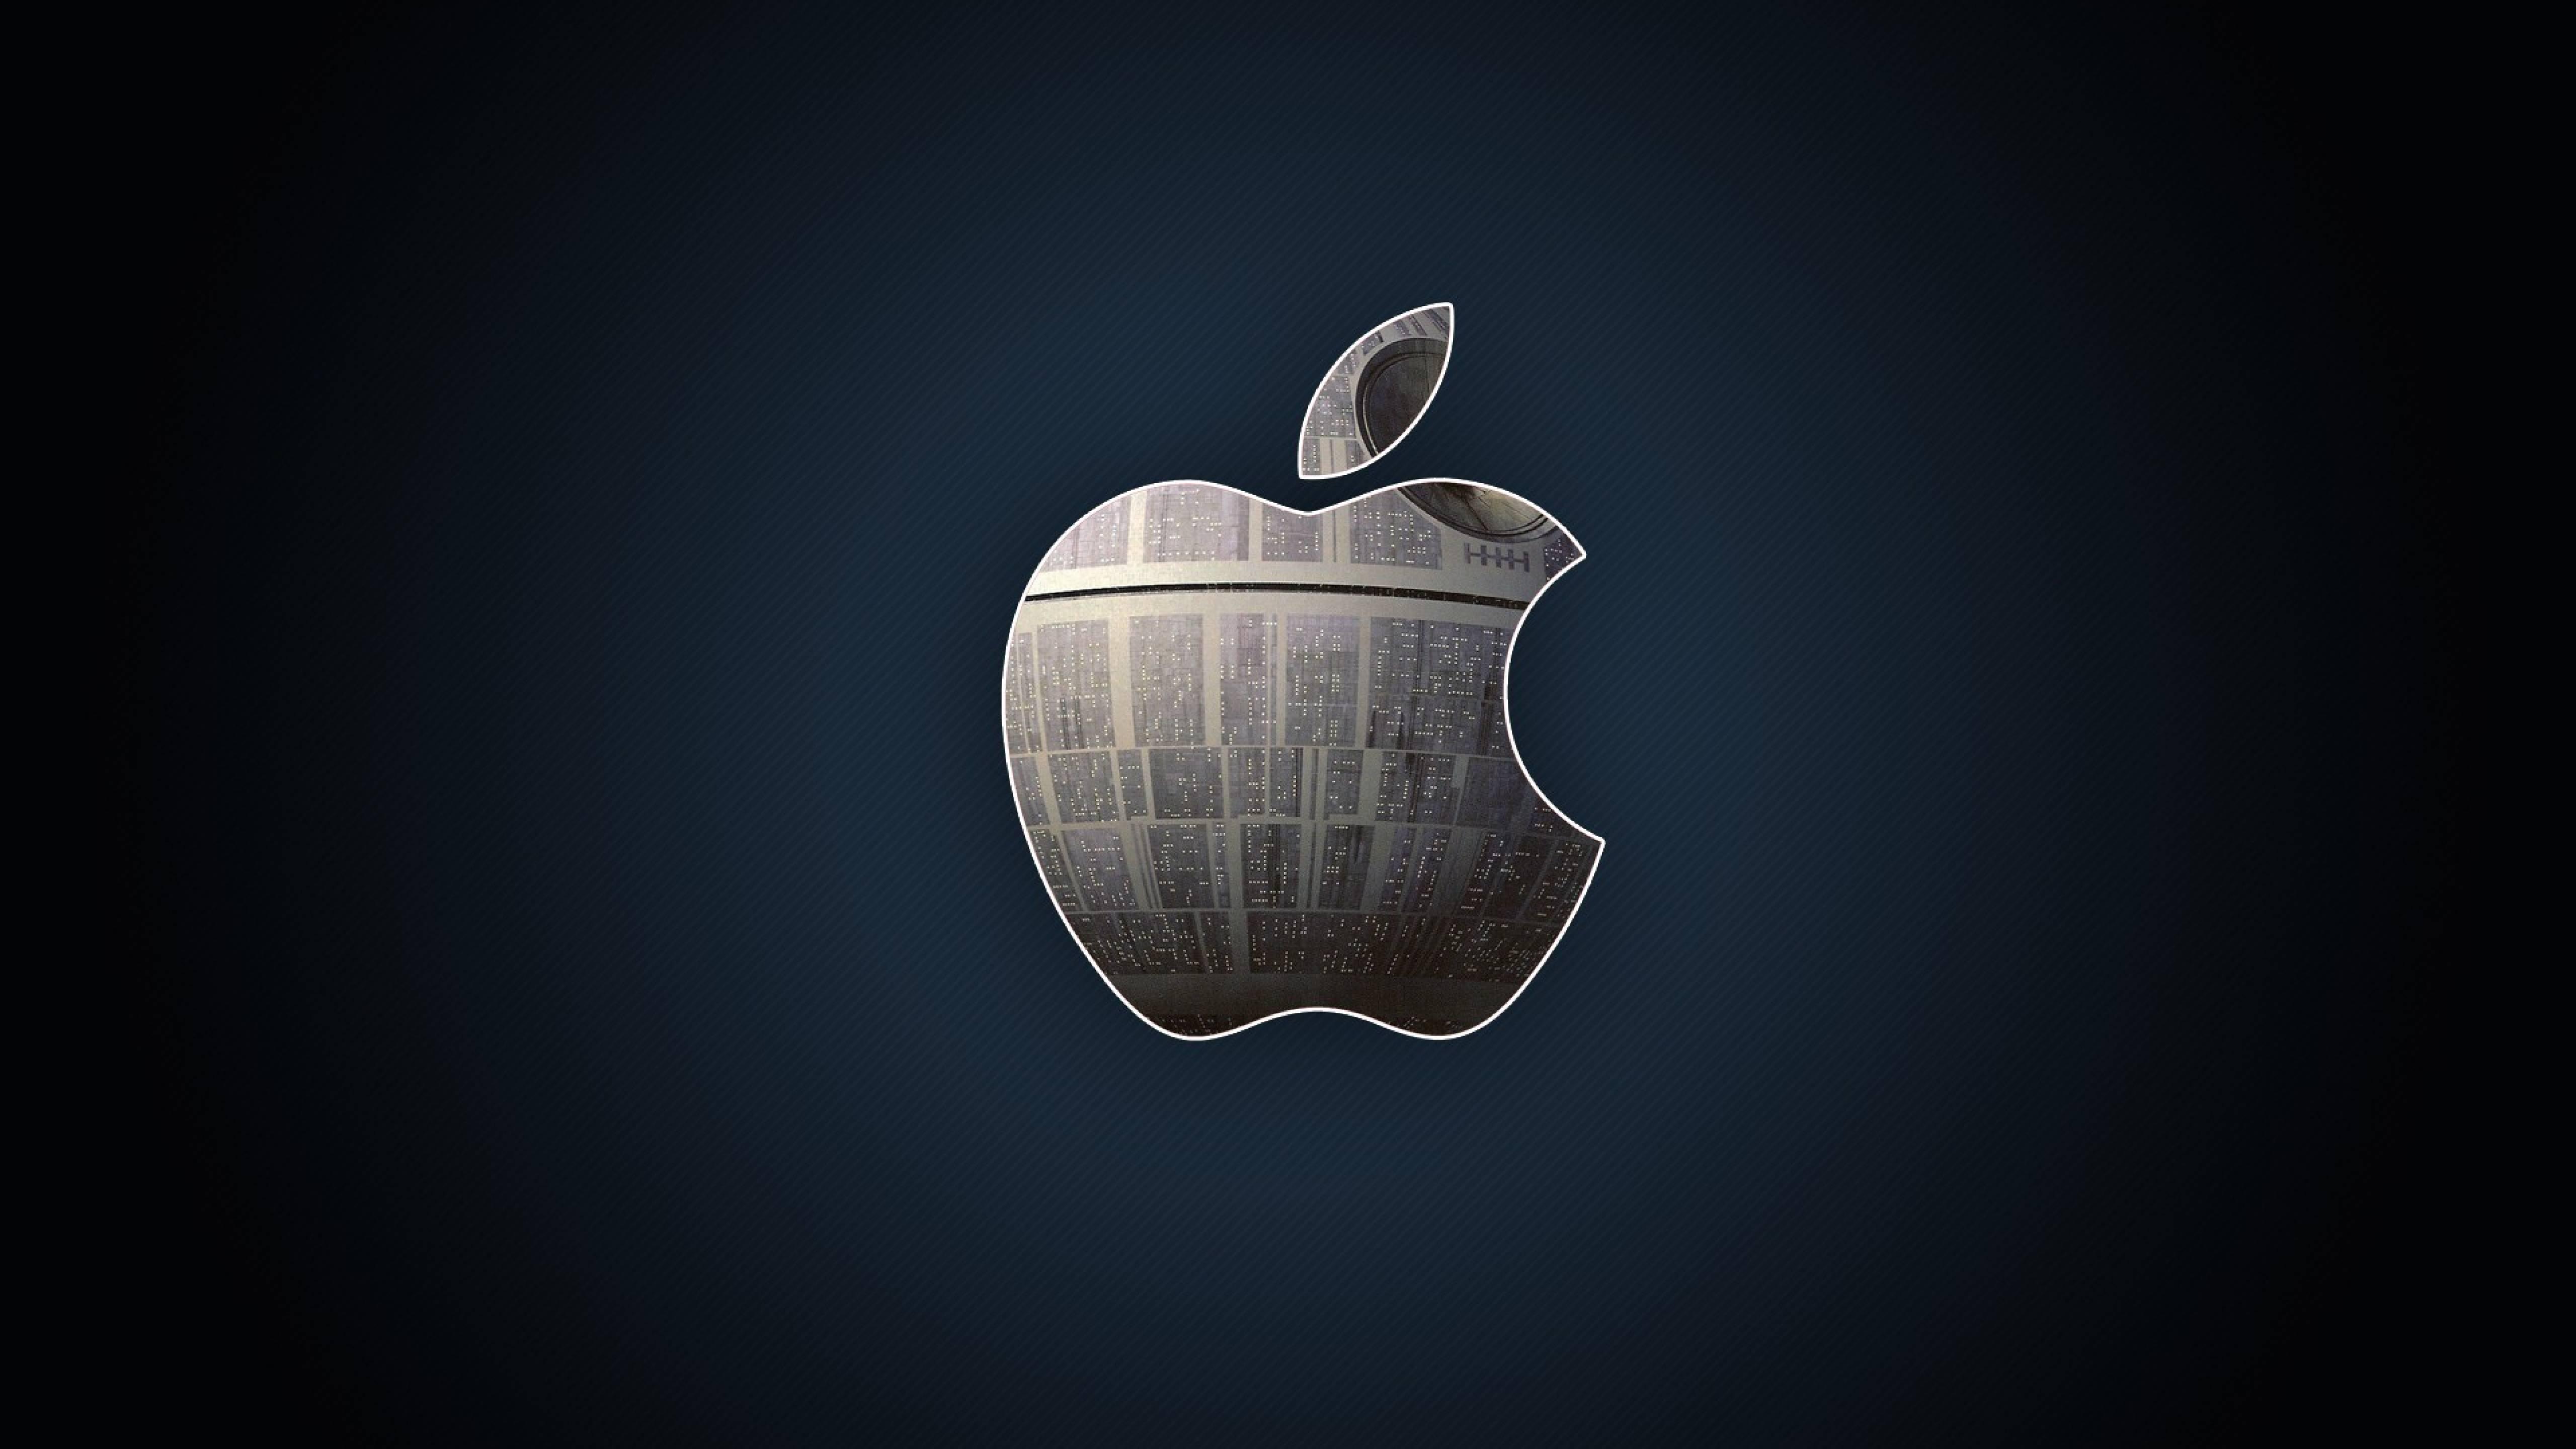 5k Apple Logo Wallpapers Top Free 5k Apple Logo Backgrounds Wallpaperaccess